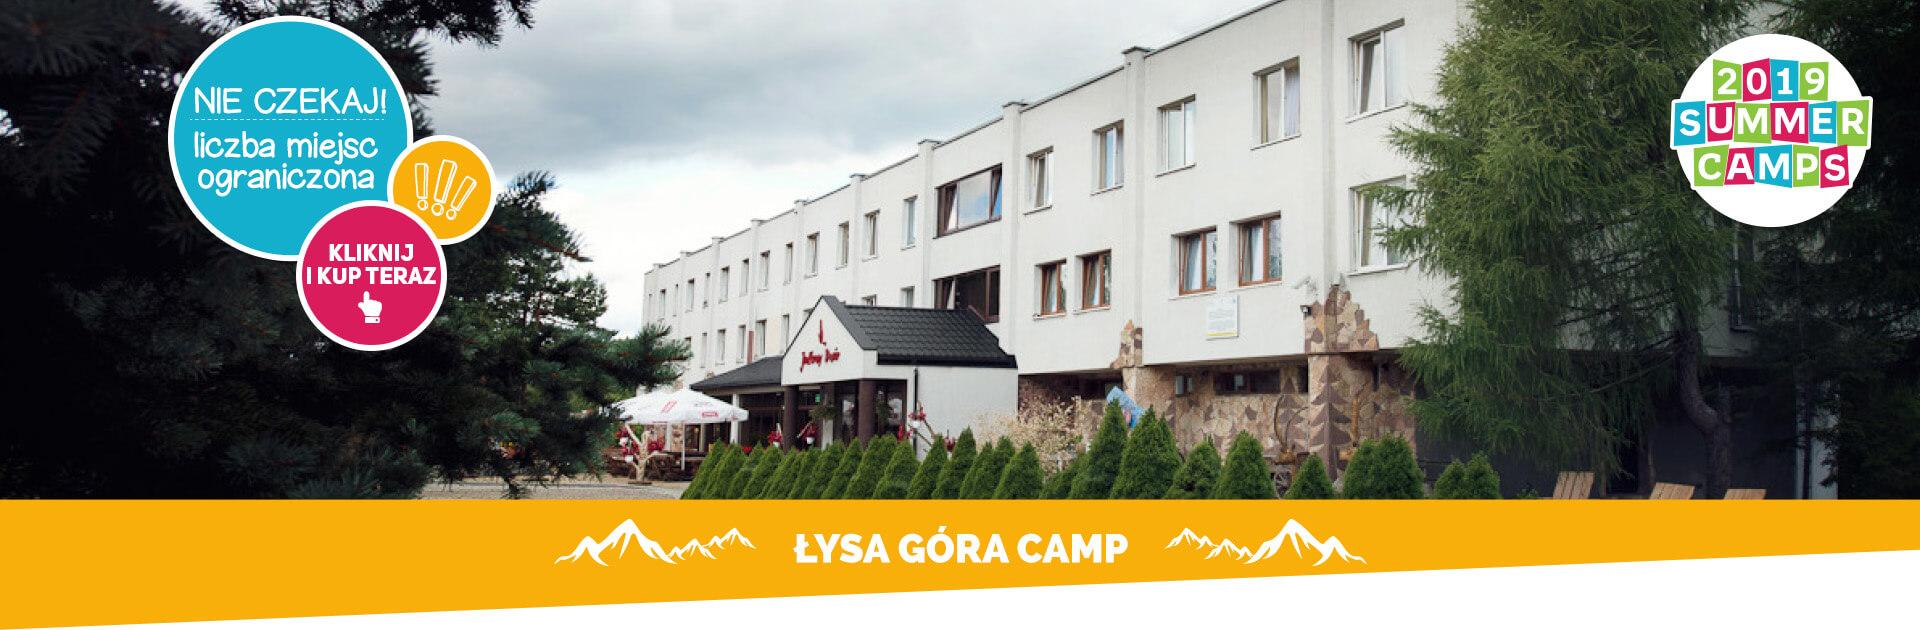 banner_gora_lysagora